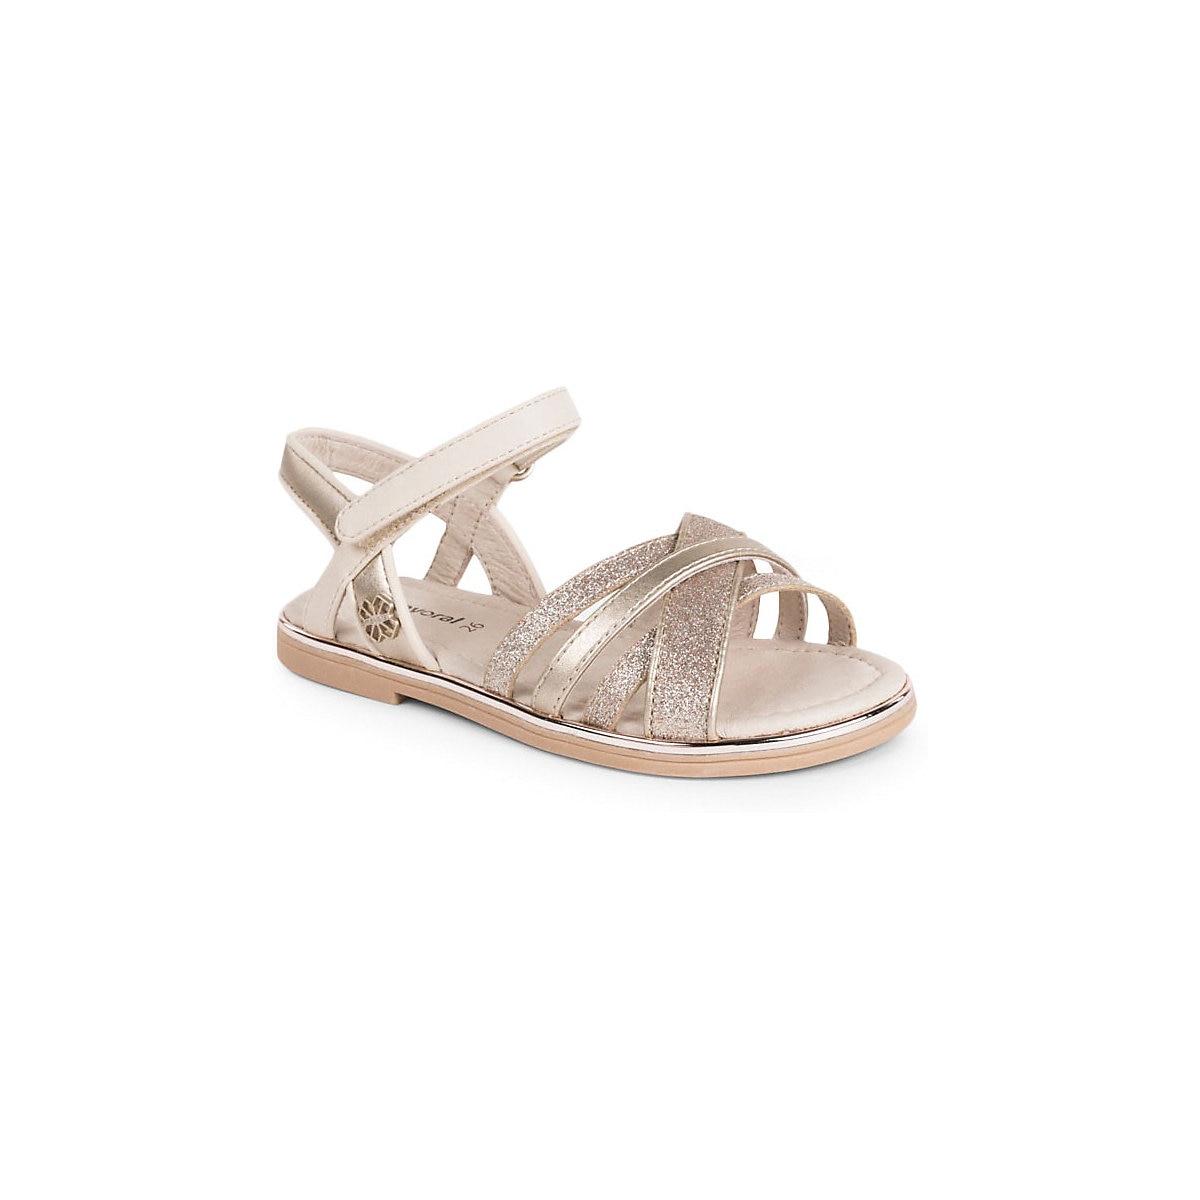 MAYORAL Sandals 10643535 children\'s shoes comfortable light summer Girls Beige Hook & Loop Sequined MTpromo chocolate box girls summer s dream